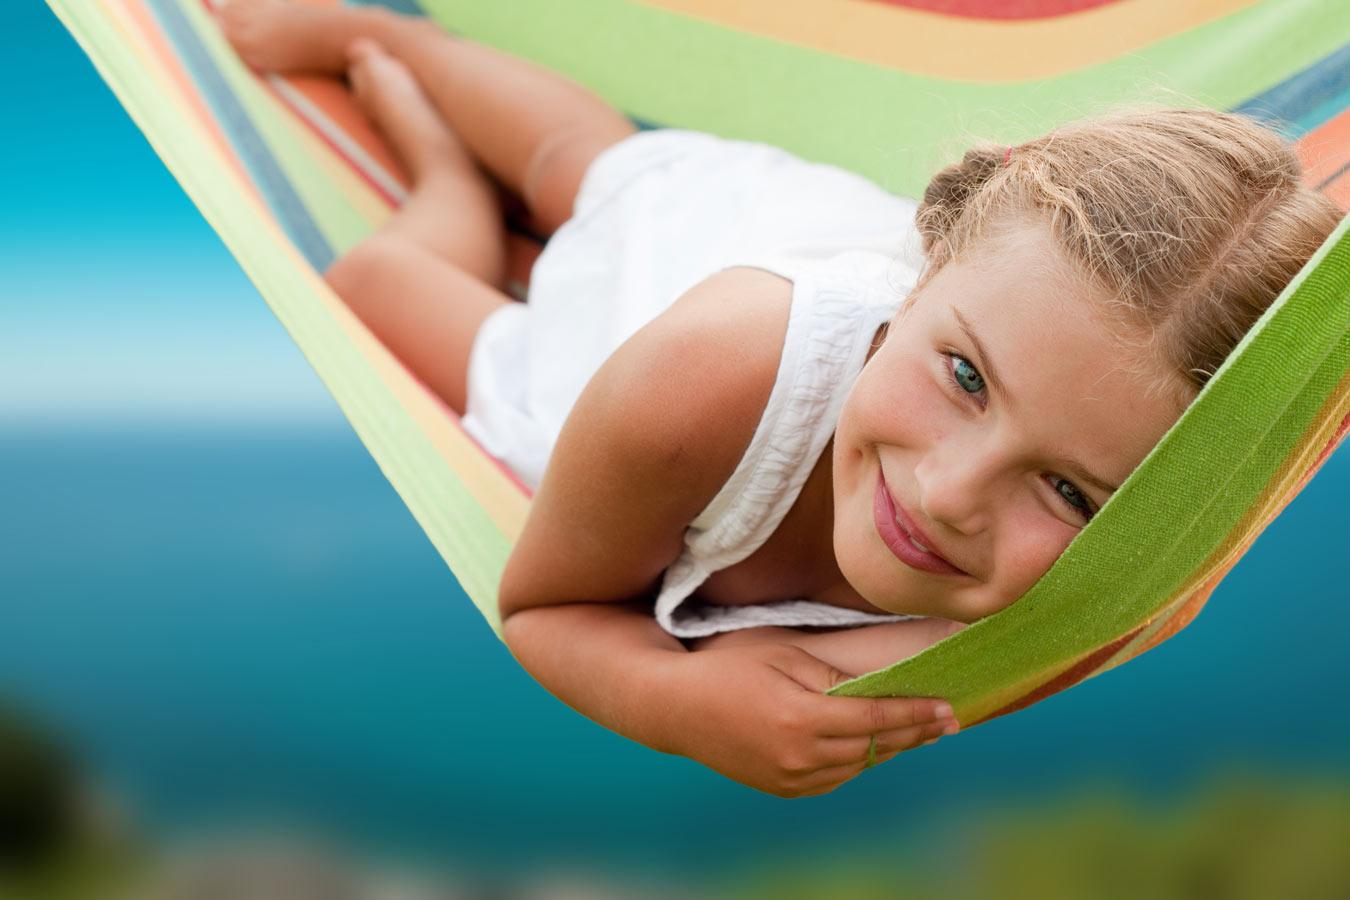 Реклама для детей: как снять ребенка в рекламе, кастинги, съемки 93